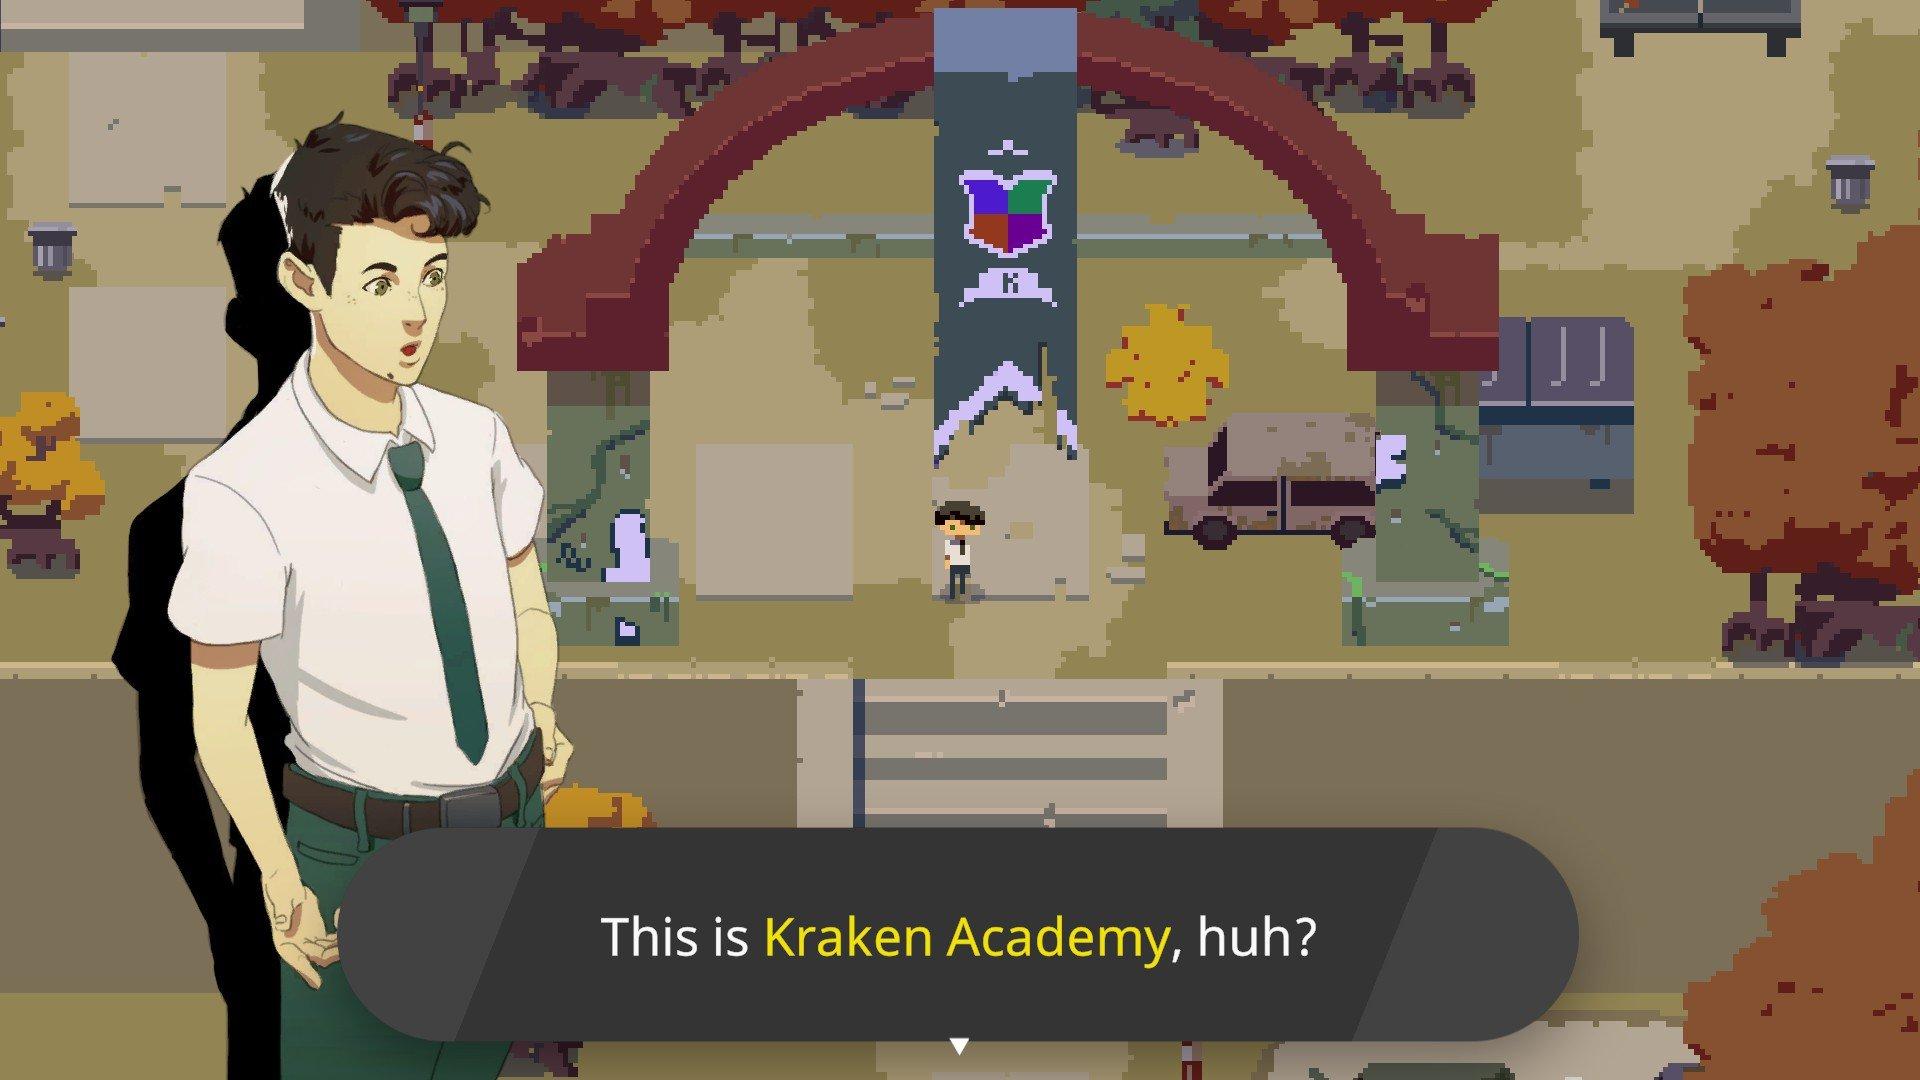 Kraken Academy!! - Exploration